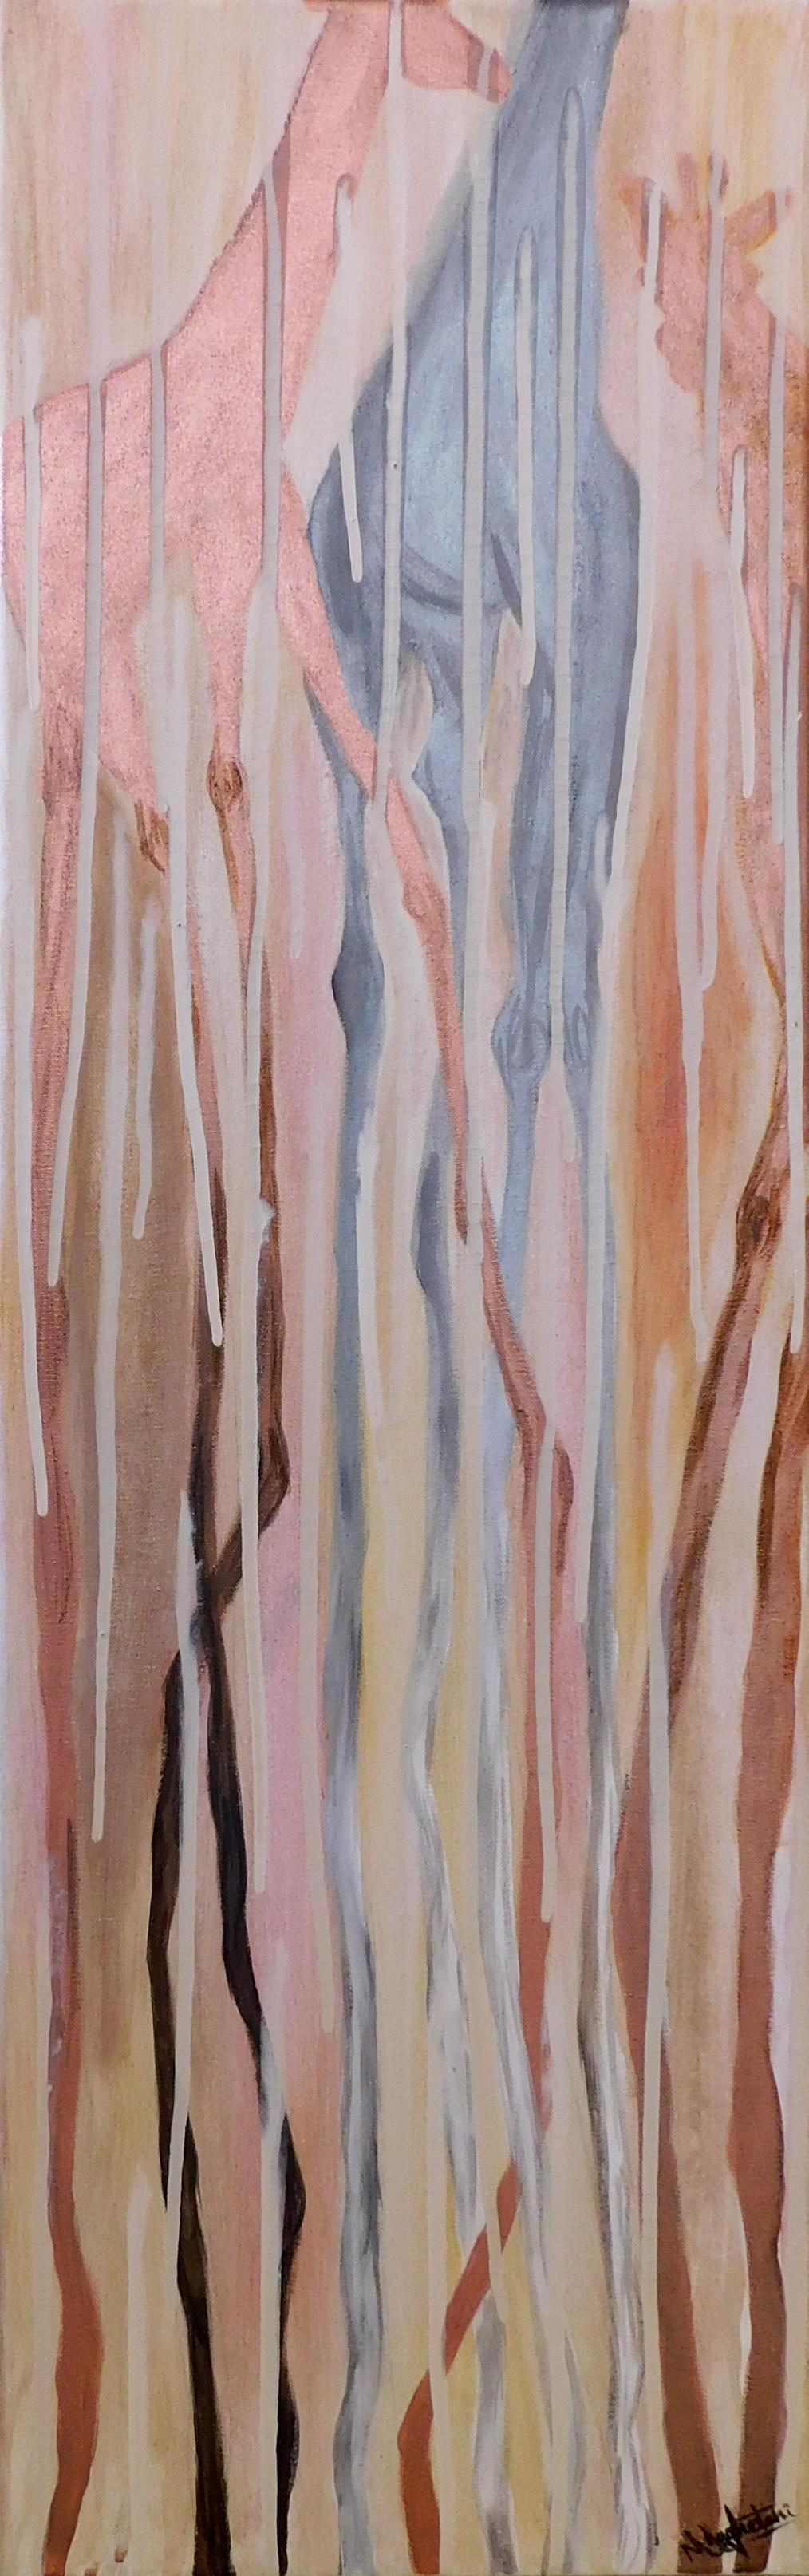 Roaming Ruminants Natalie Daghestani Art Dubai Artist BSAB